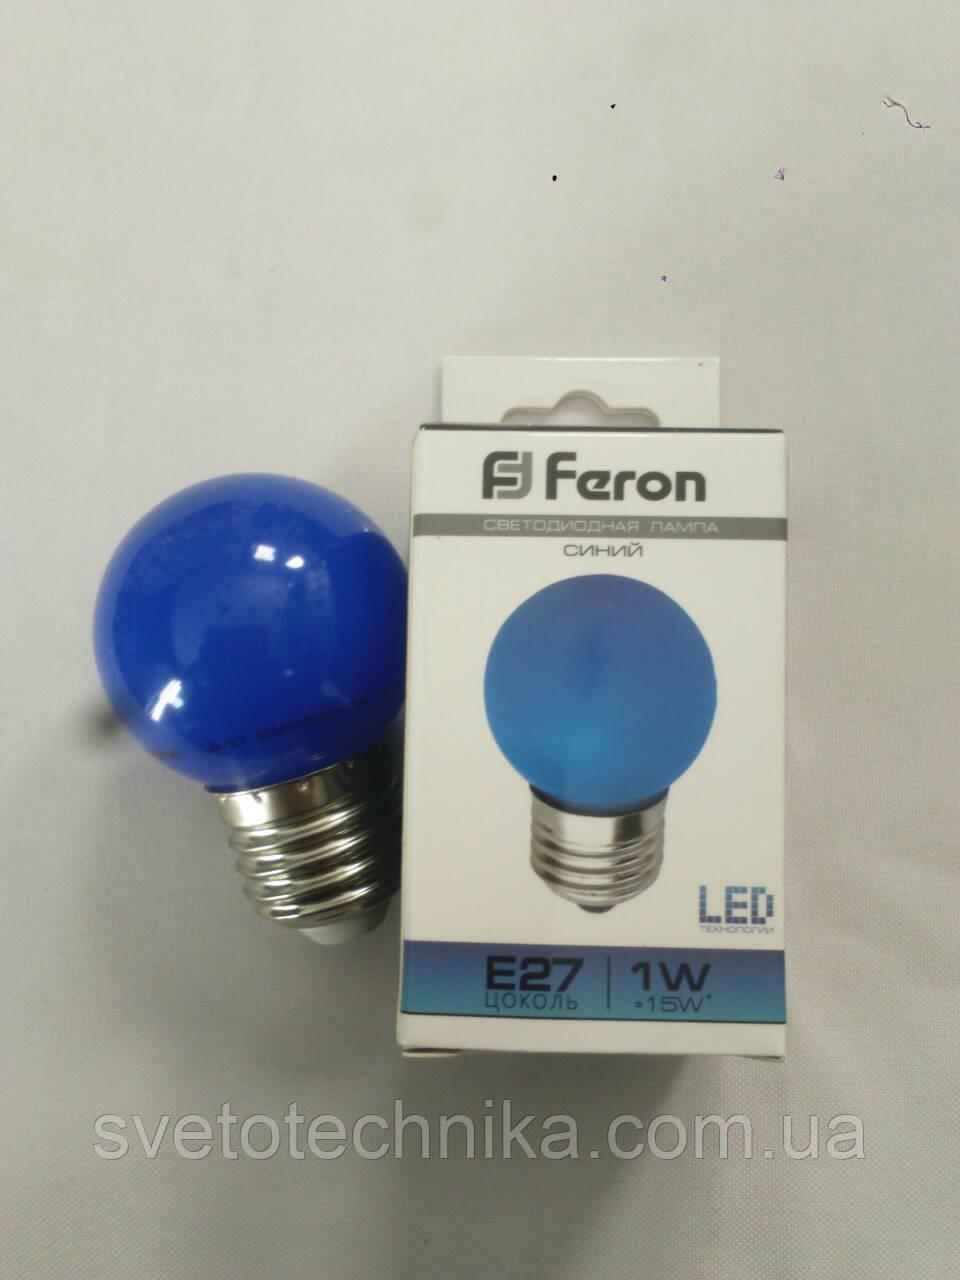 Светодиодная лампа  Feron LB-37 шарик E27 1W 6400К (синий)